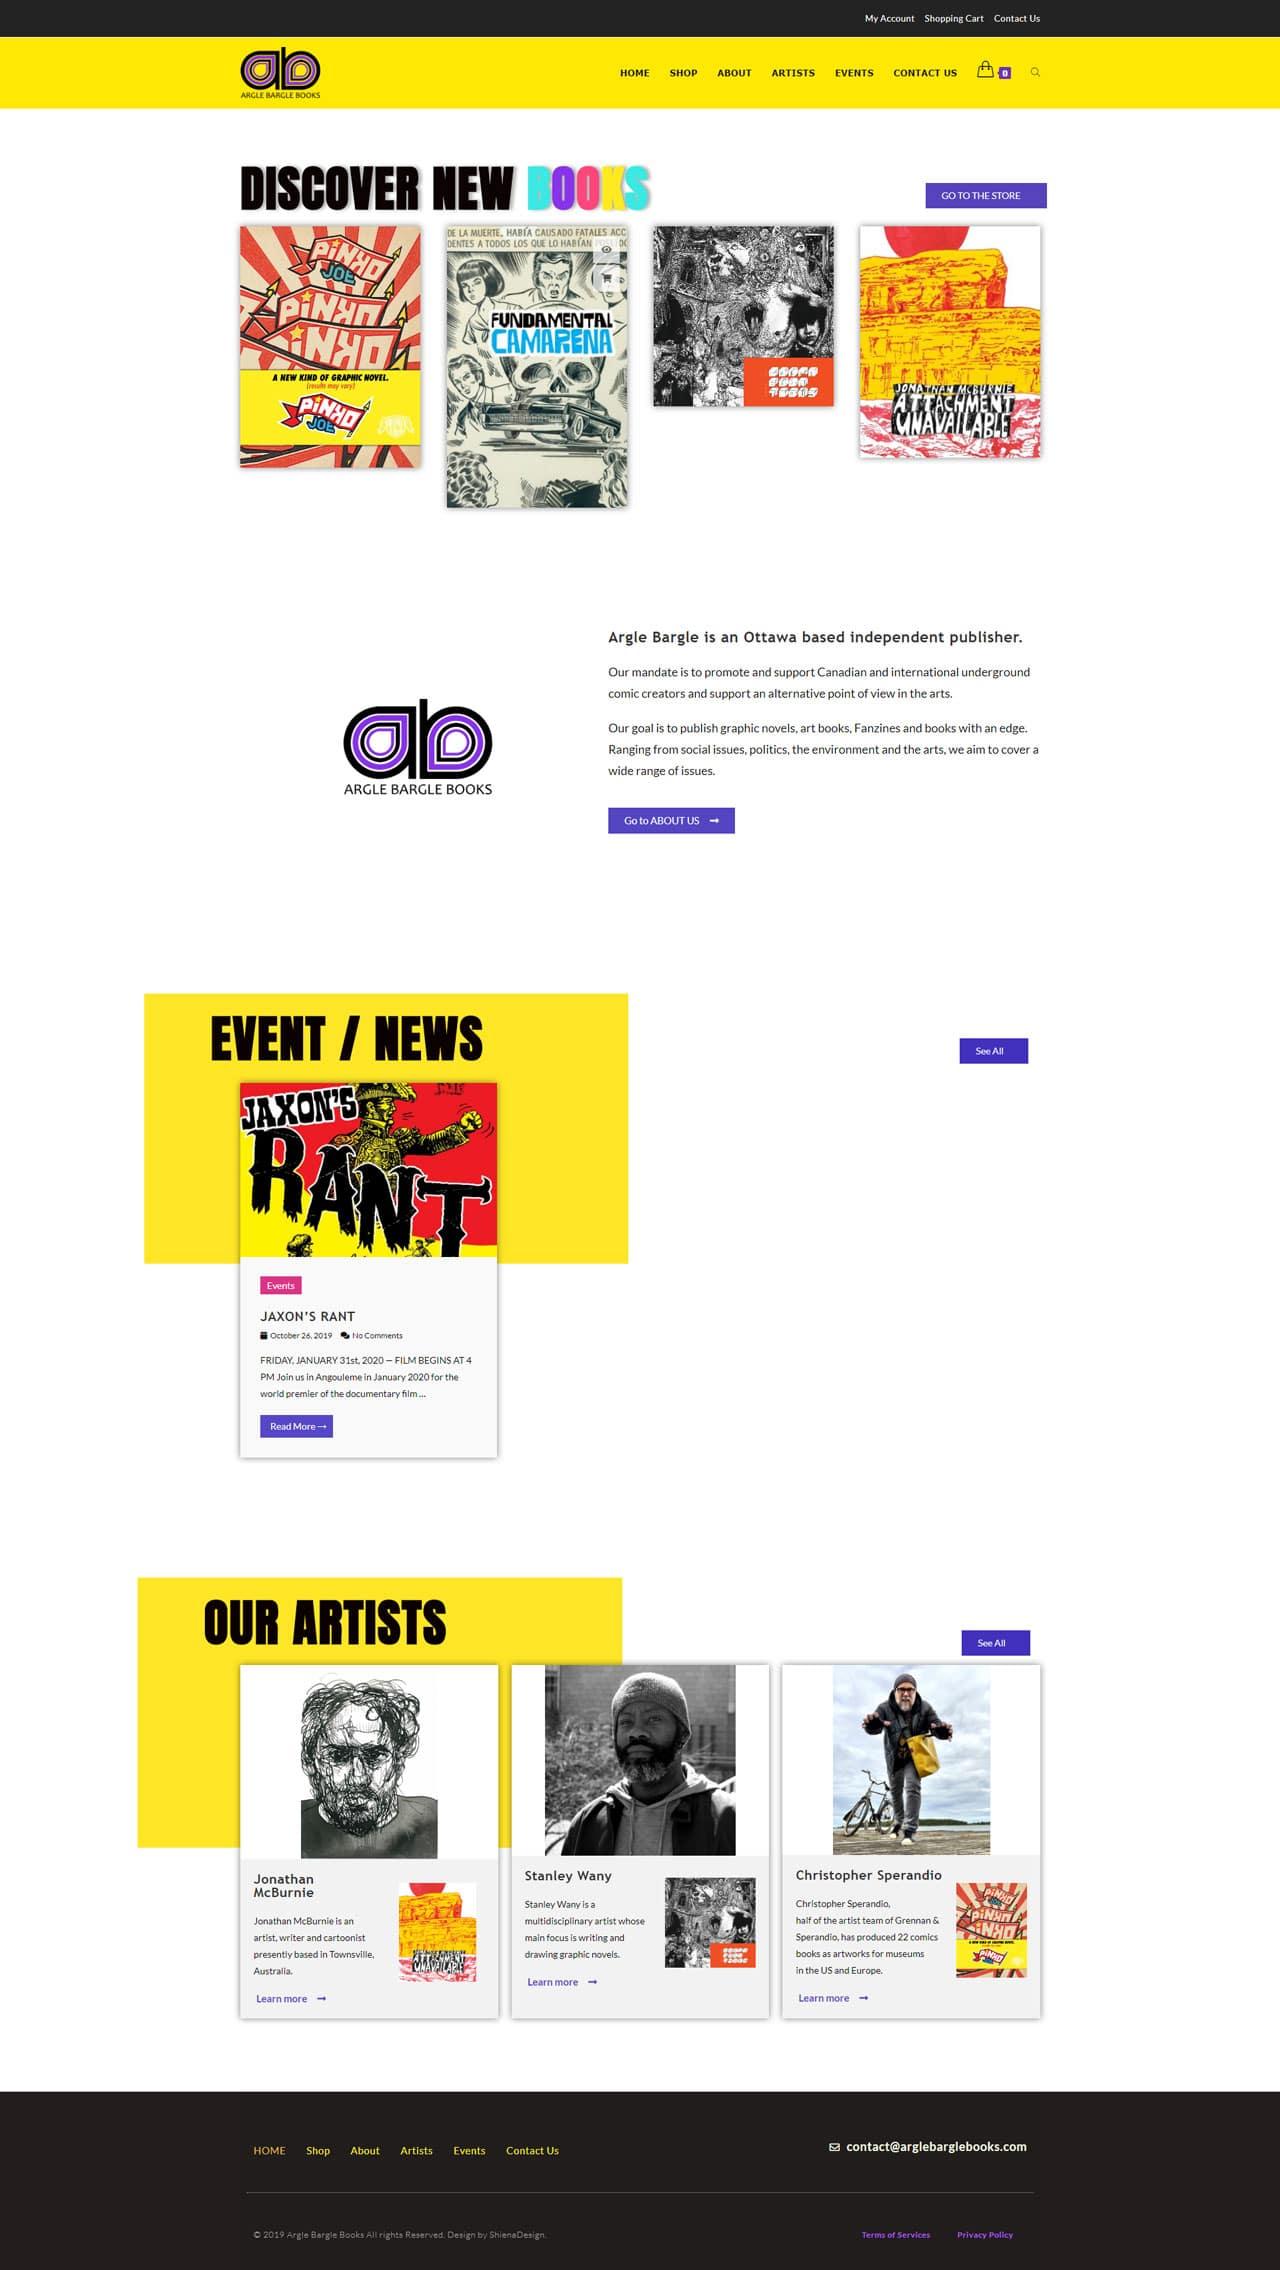 Arglebargebooks.com's home page demo